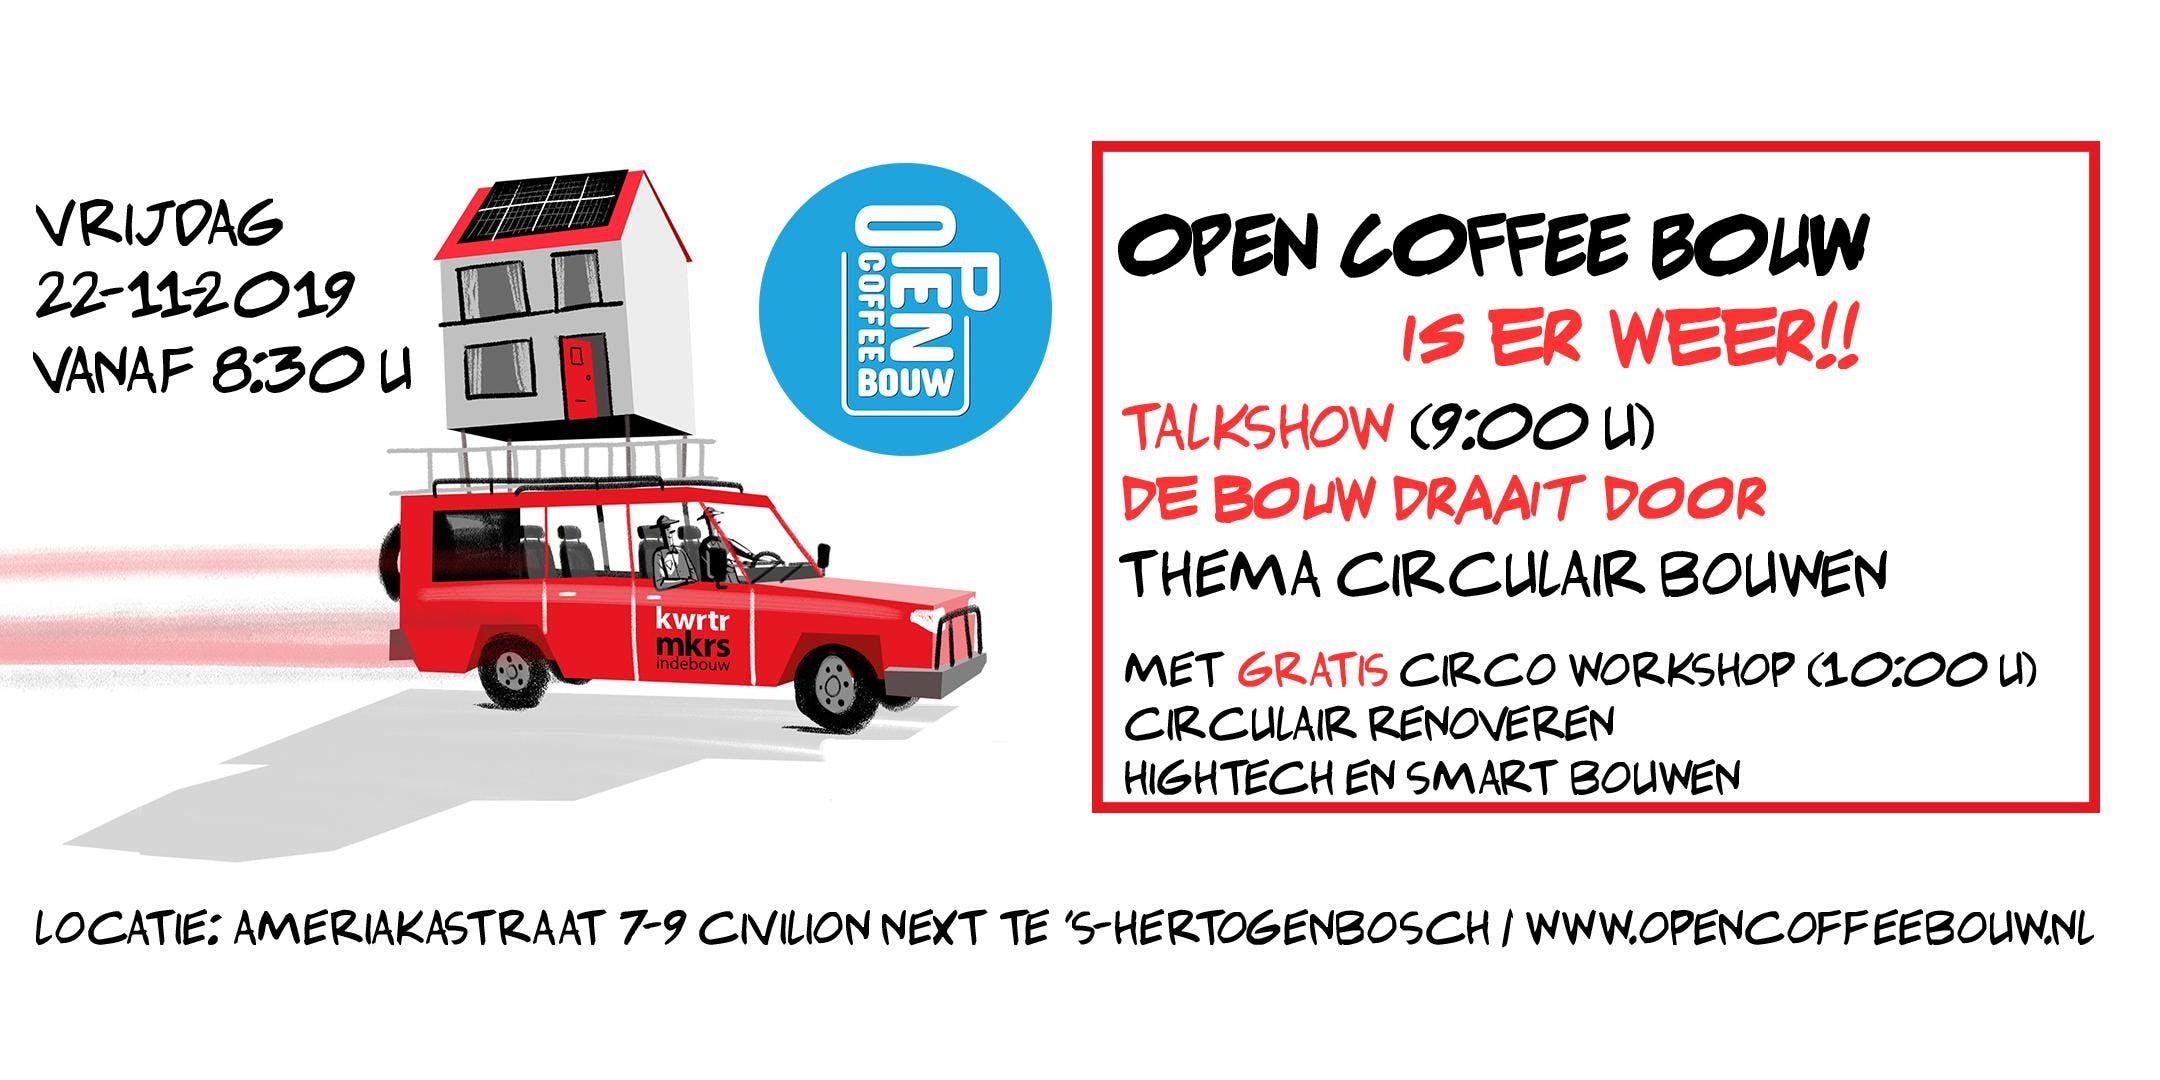 Open Coffee Bouw | Thema Circulair bouwen